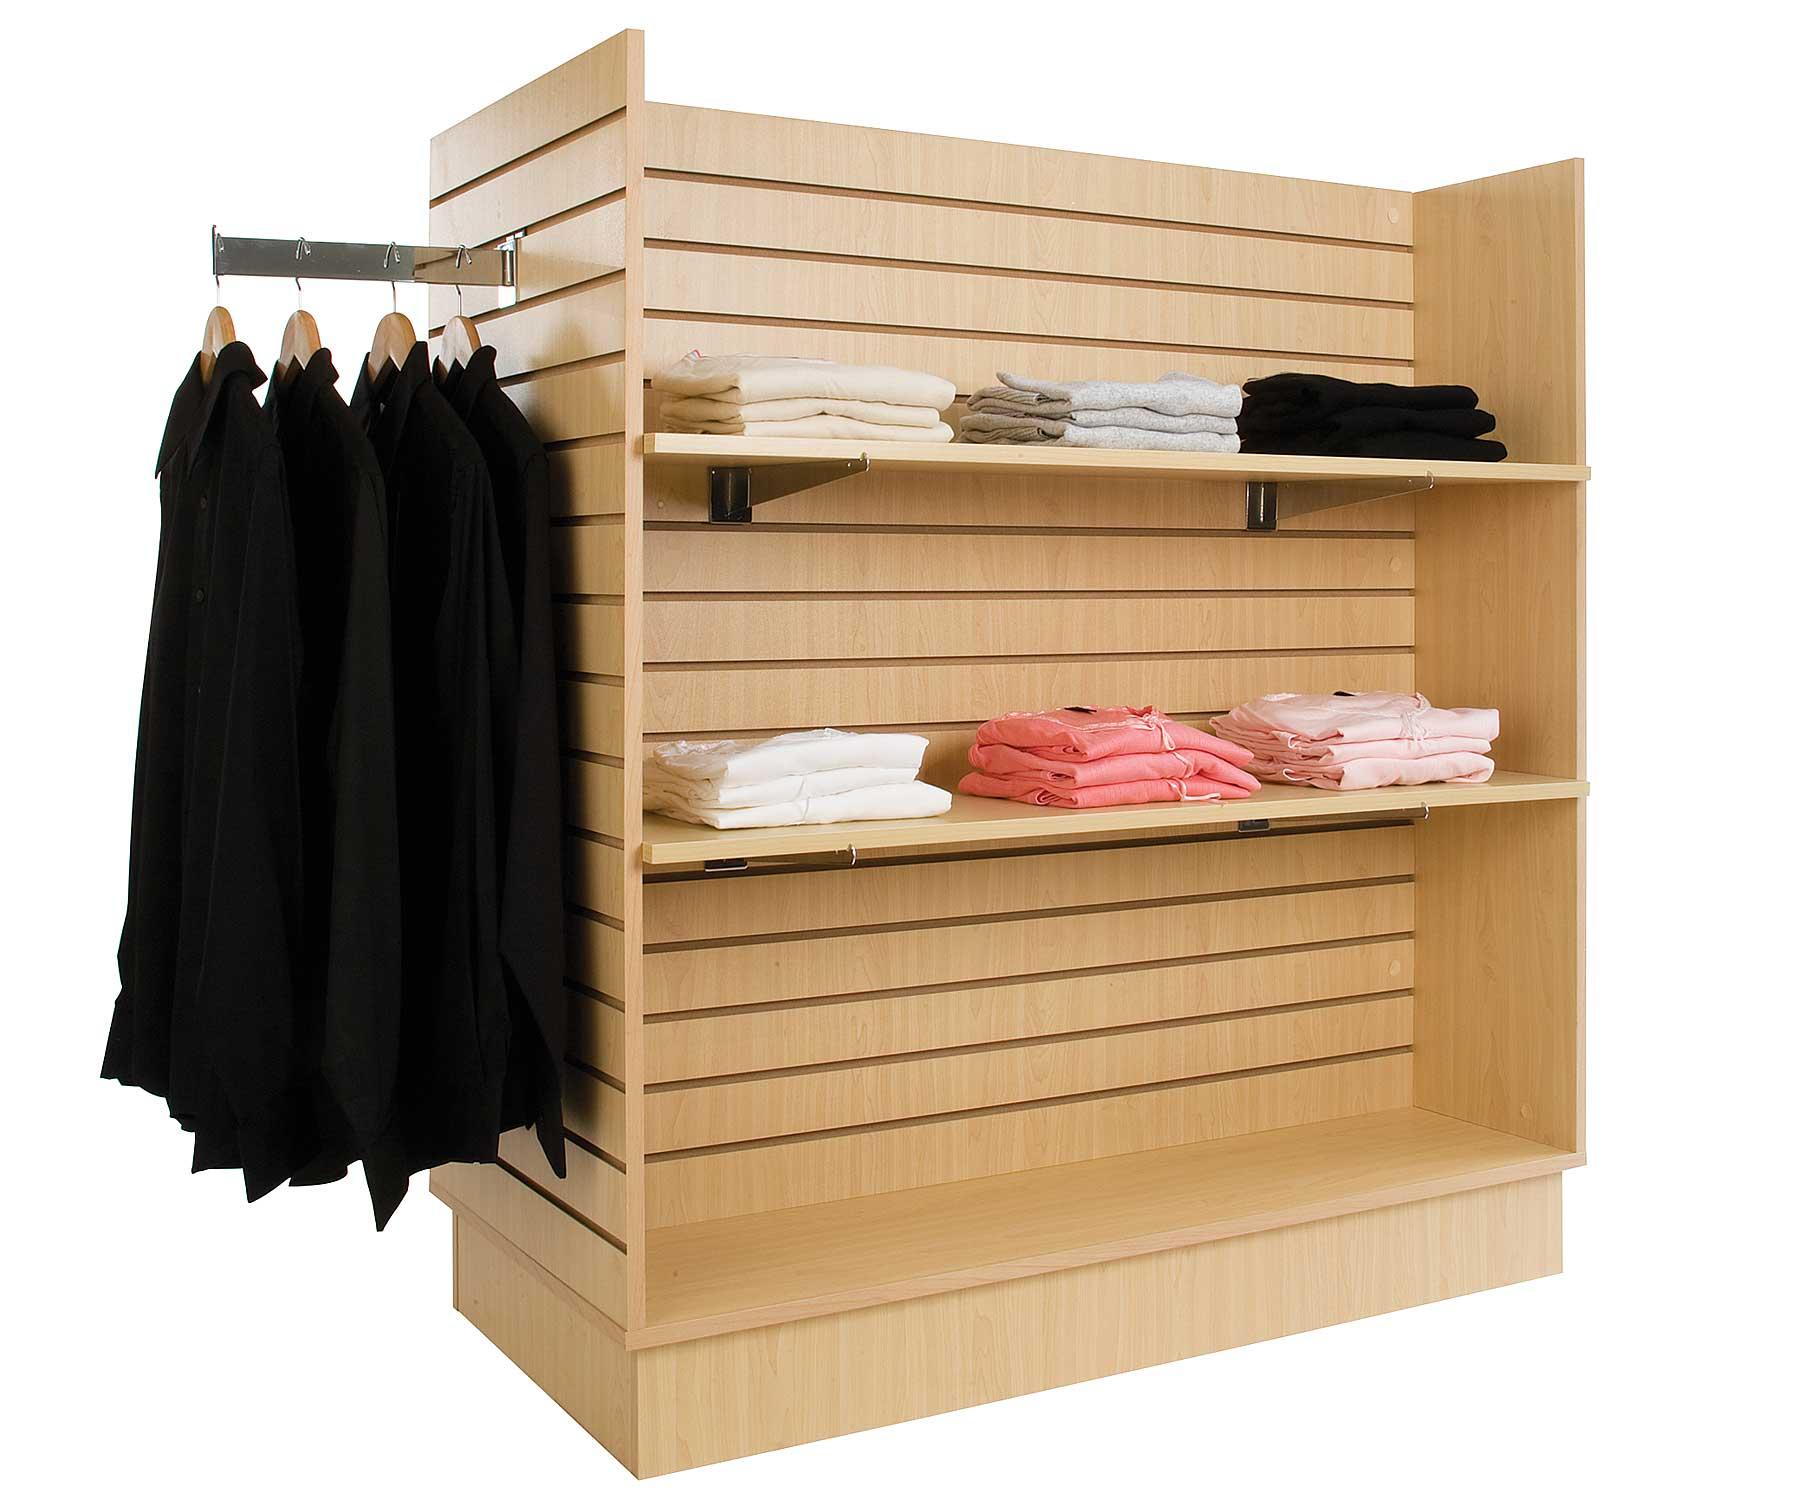 "46-1/2"" x 10"" maple shelf for 990327 Maple Slatwall H-Unit Merchandiser -ea. - SKU: 990330"